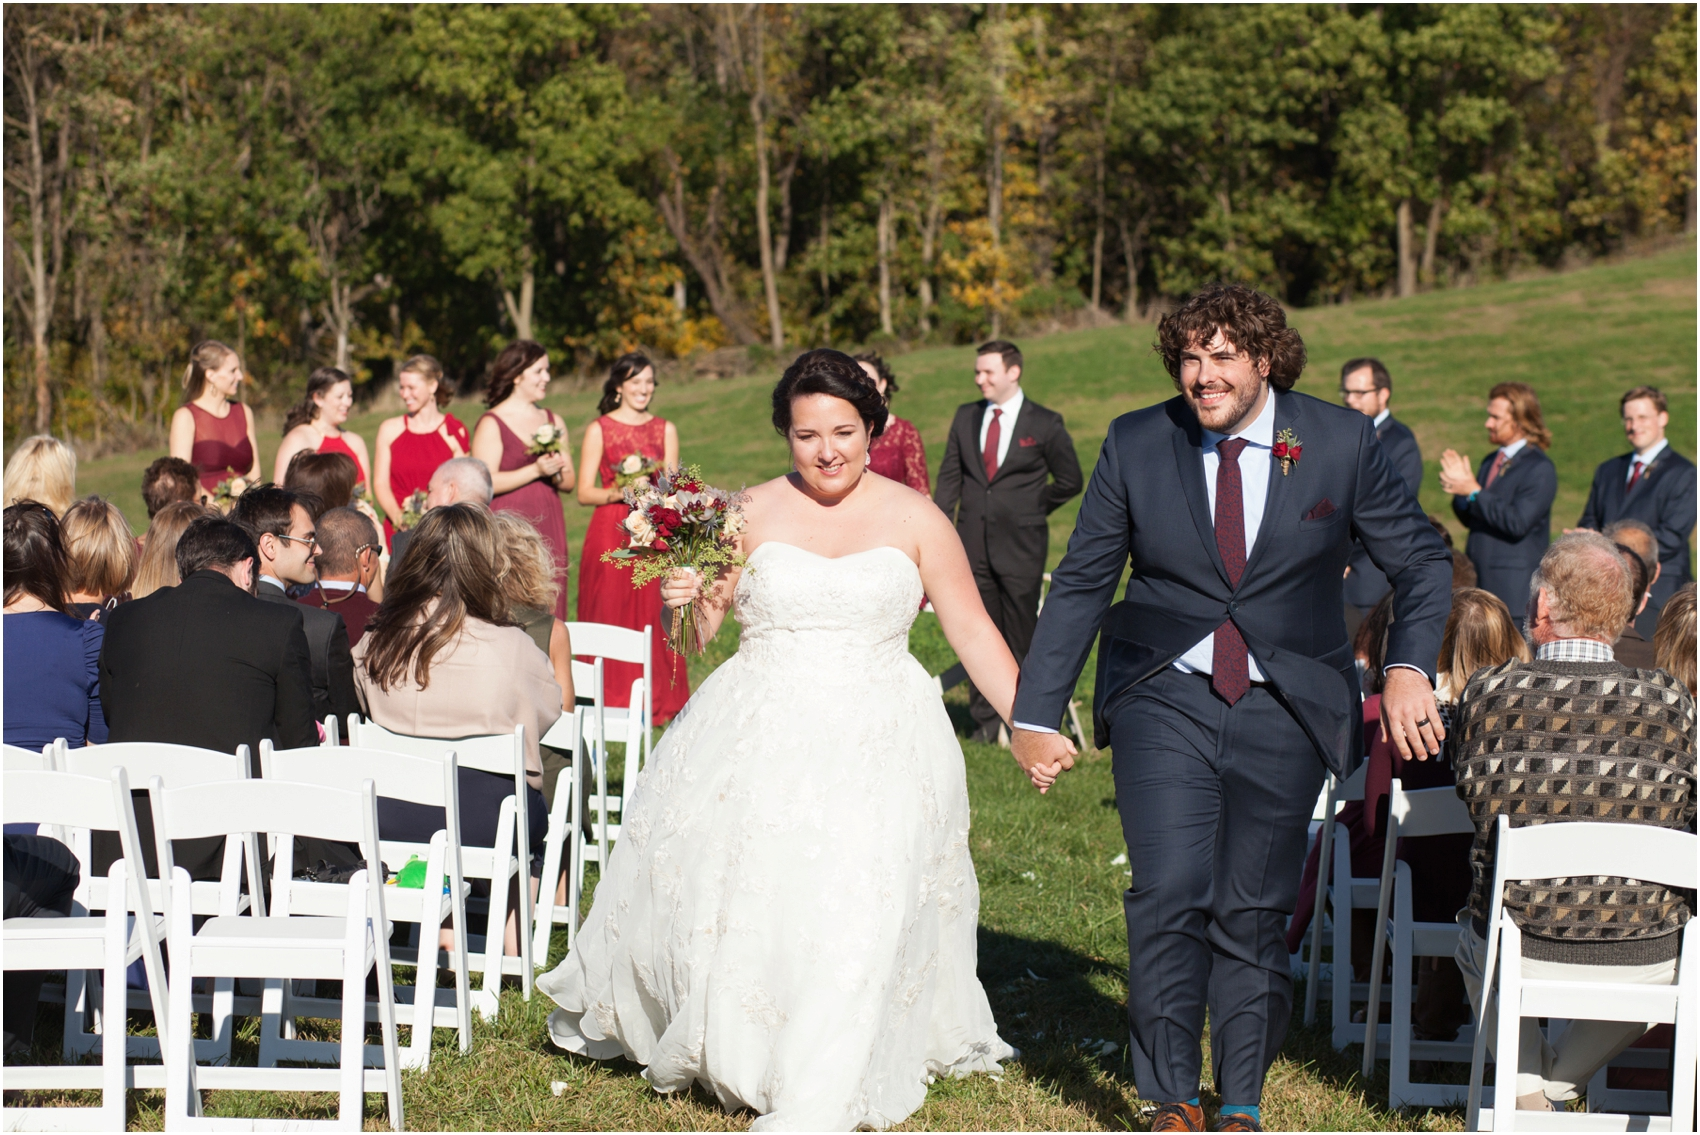 On-Sunny-Slope-Farm-Fall-Virginia-Wedding-2891.jpg